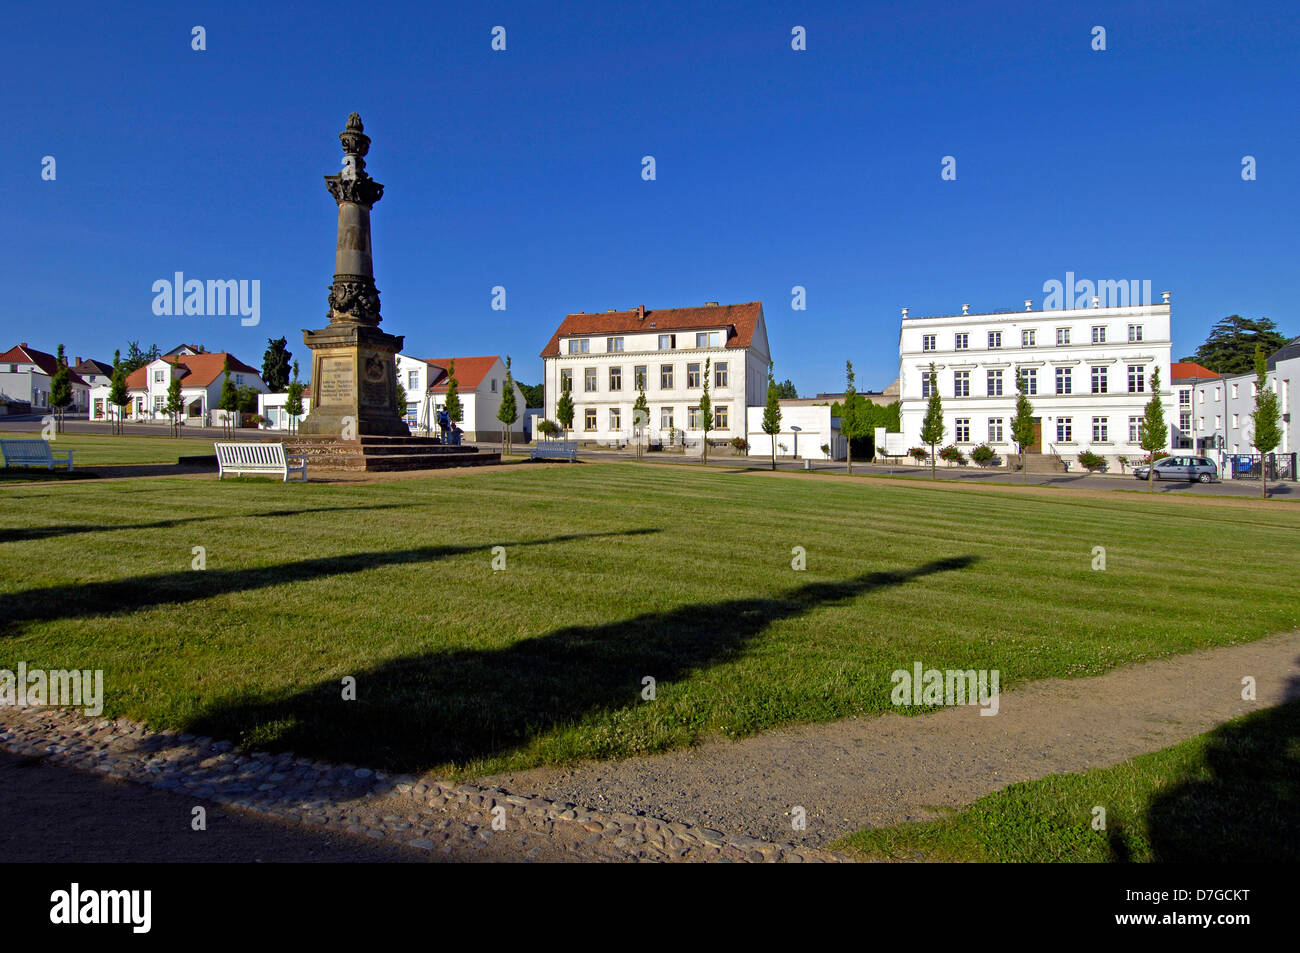 Germany, Mecklenburg-West Pomerania, island Rügen, Putbus, market - Stock Image